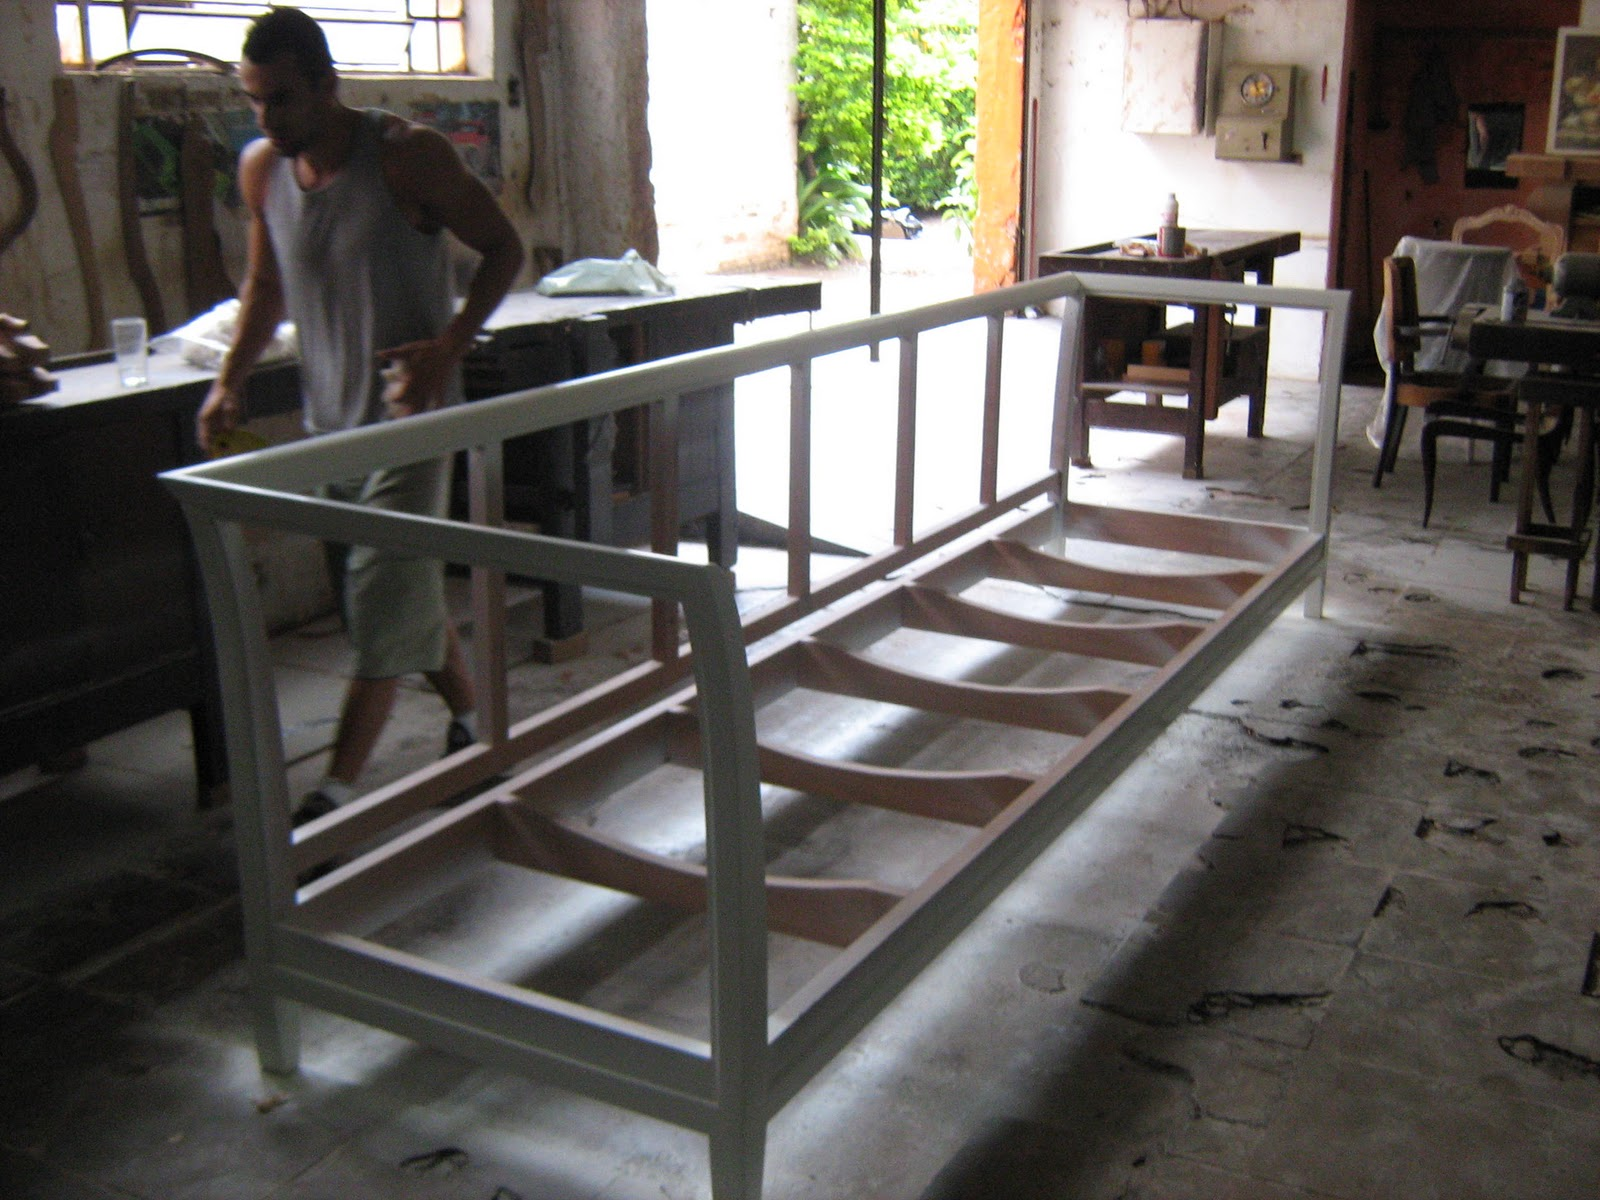 decoracao de interiores artesanal:Blog Decoração de Interiores: Decoração Arquitetura Interiores SP